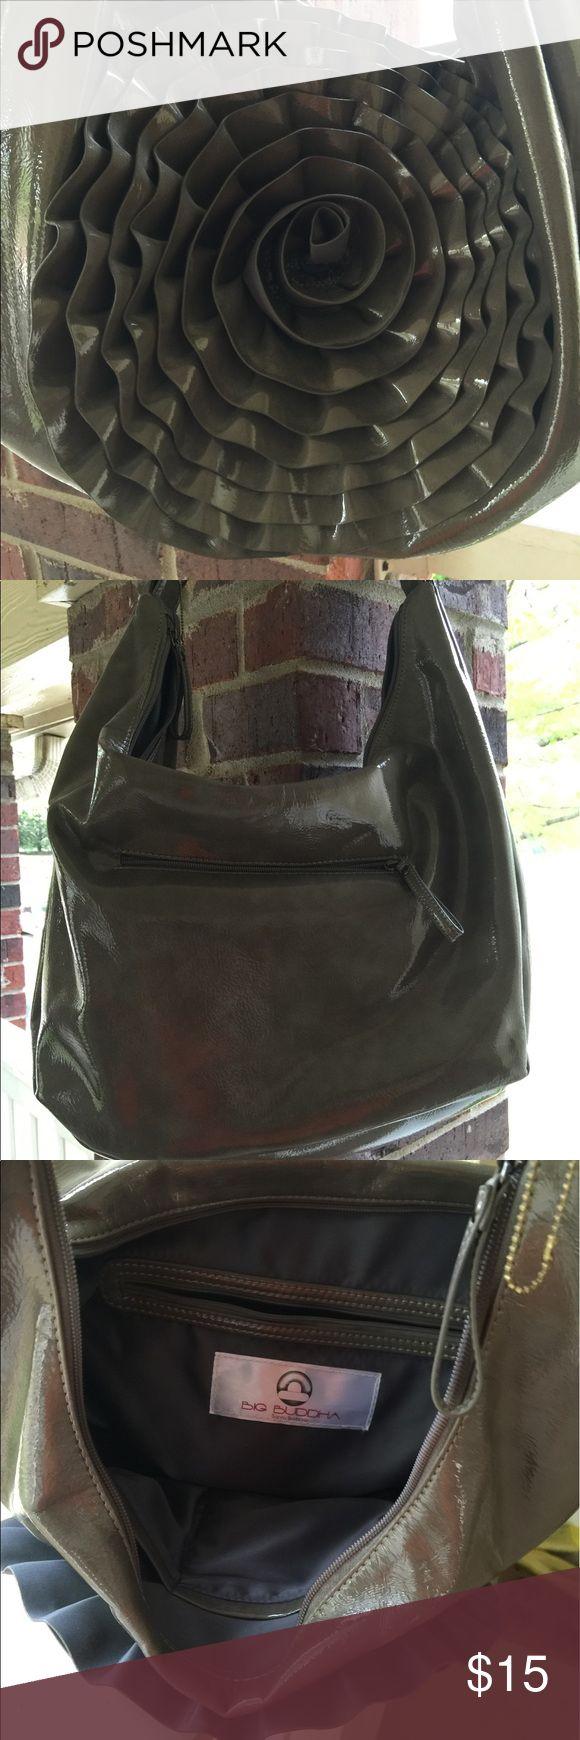 Large big Buddha grey handbag with shoulder strap Large big Buddha grey handbag with shoulder strap Big Buddha Bags Shoulder Bags